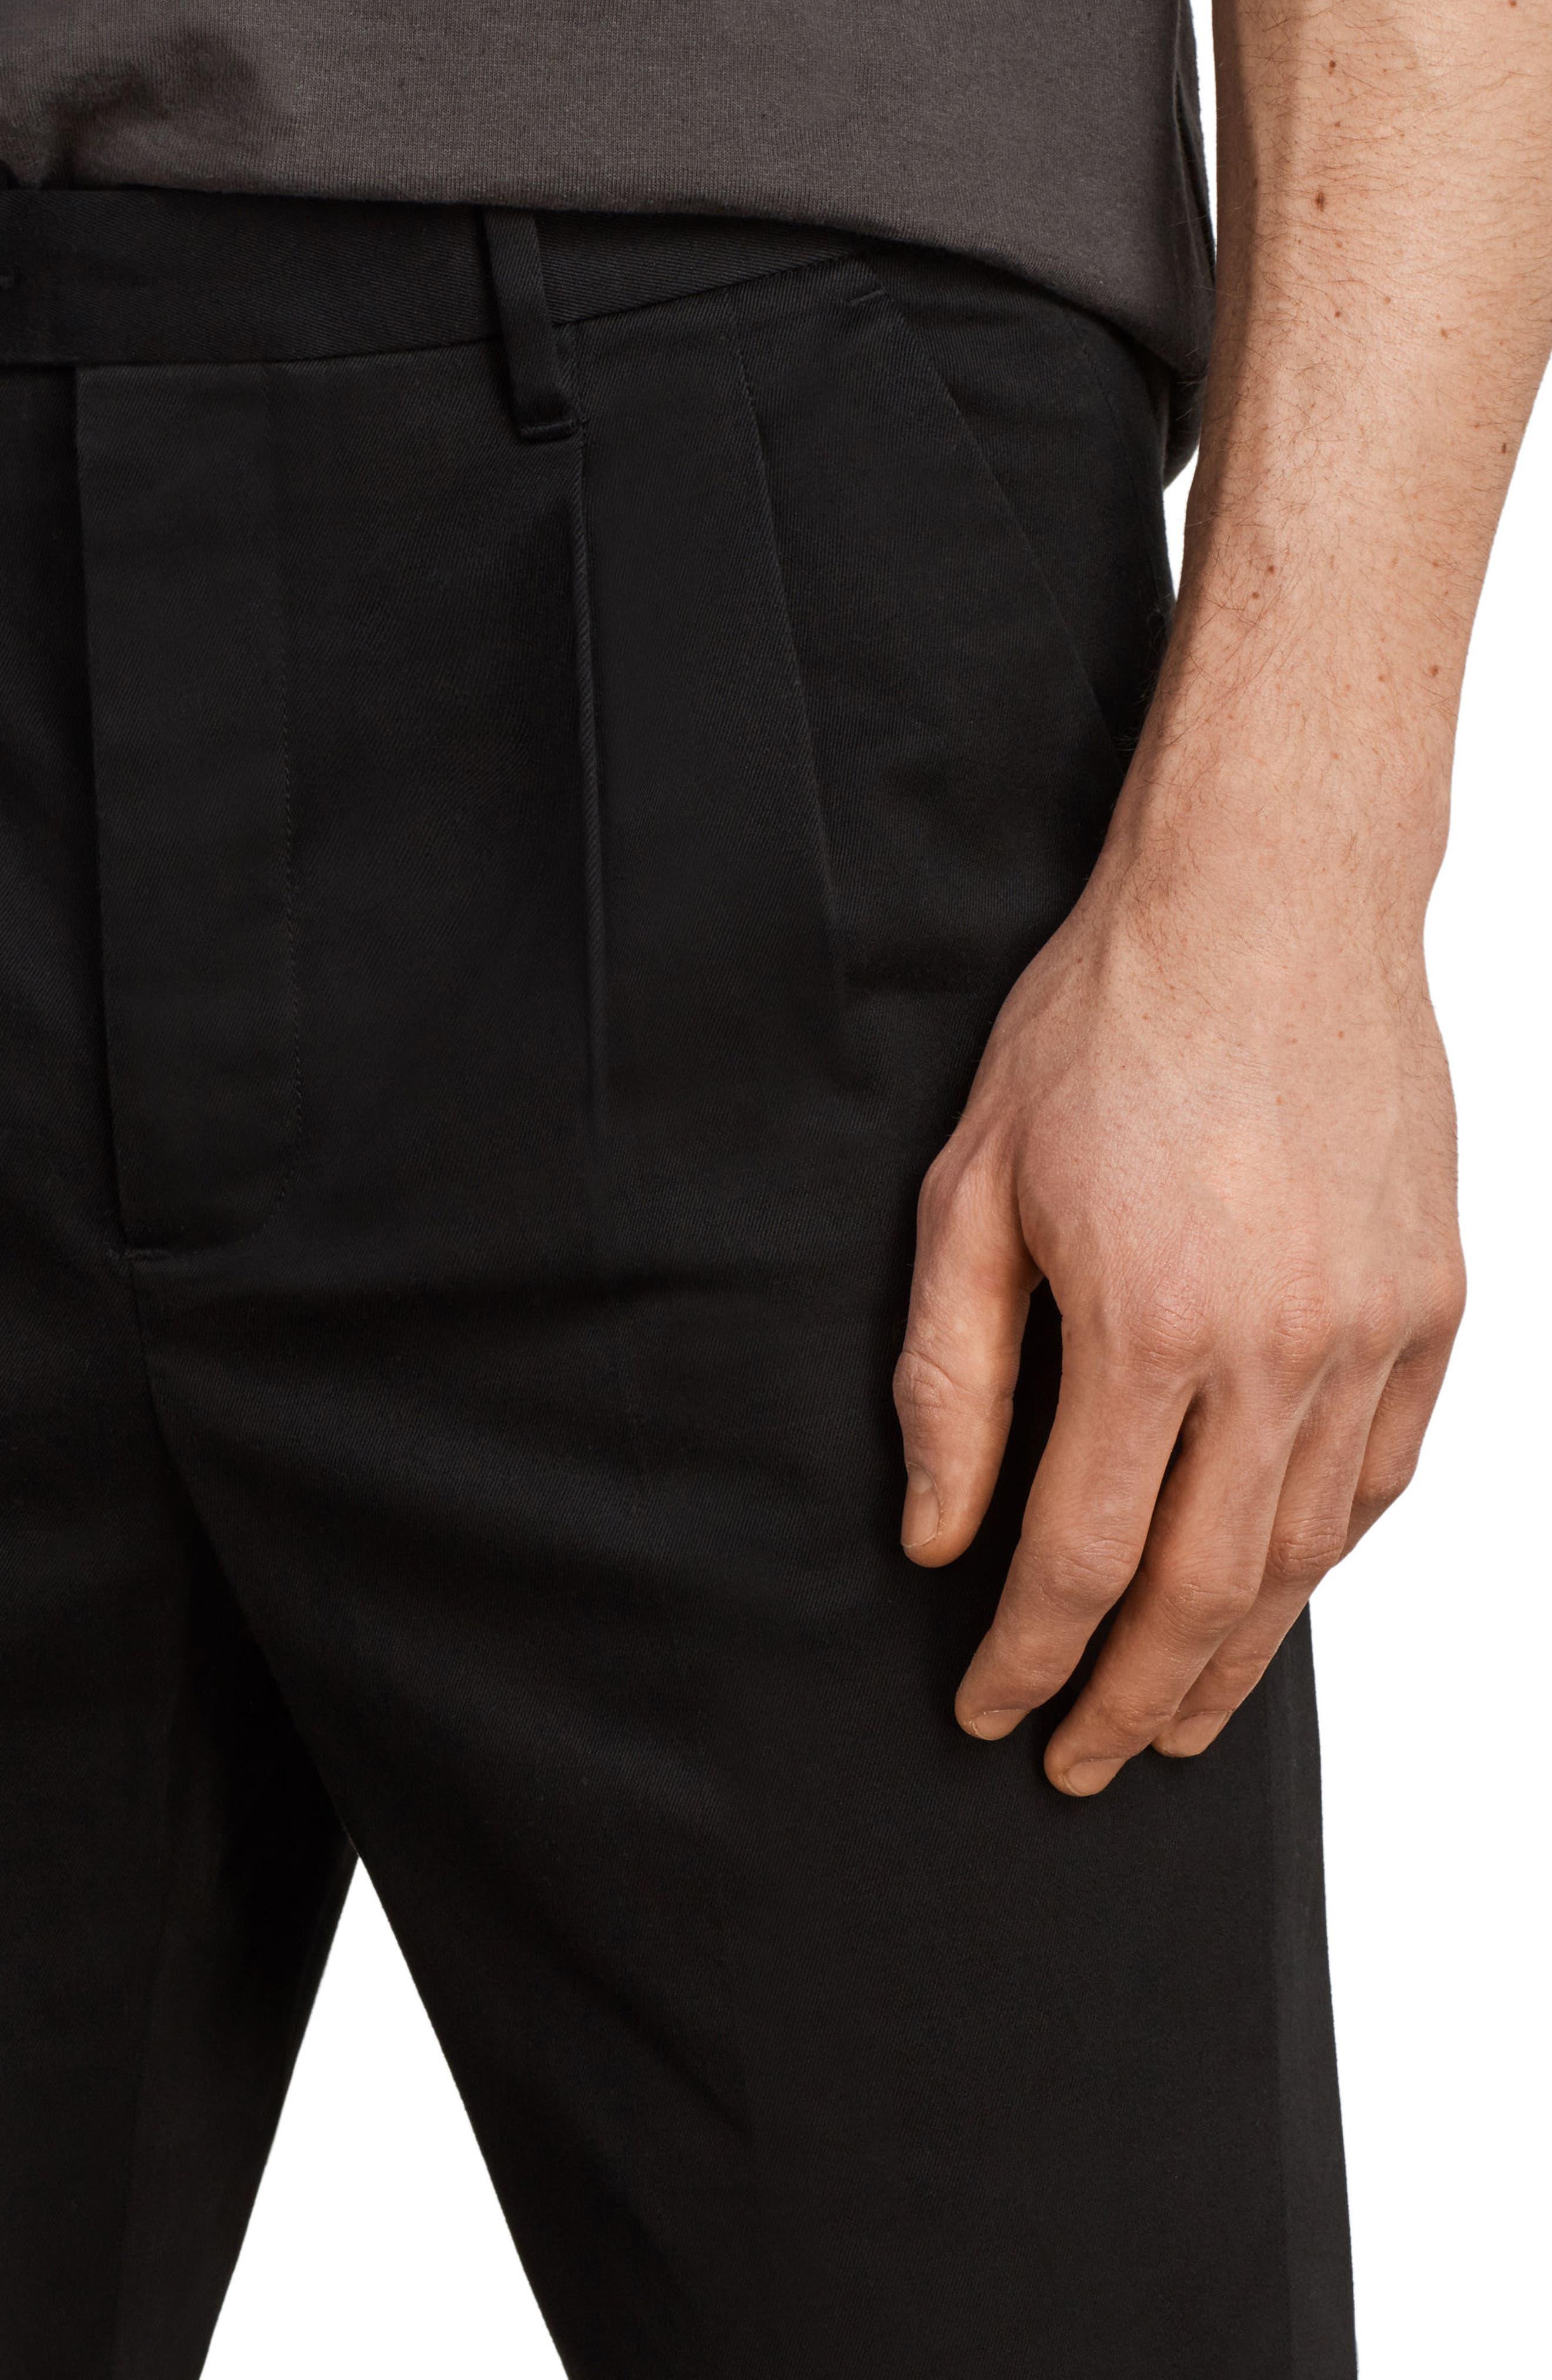 Salco Slim Fit Chino Pants,                             Alternate thumbnail 4, color,                             Black